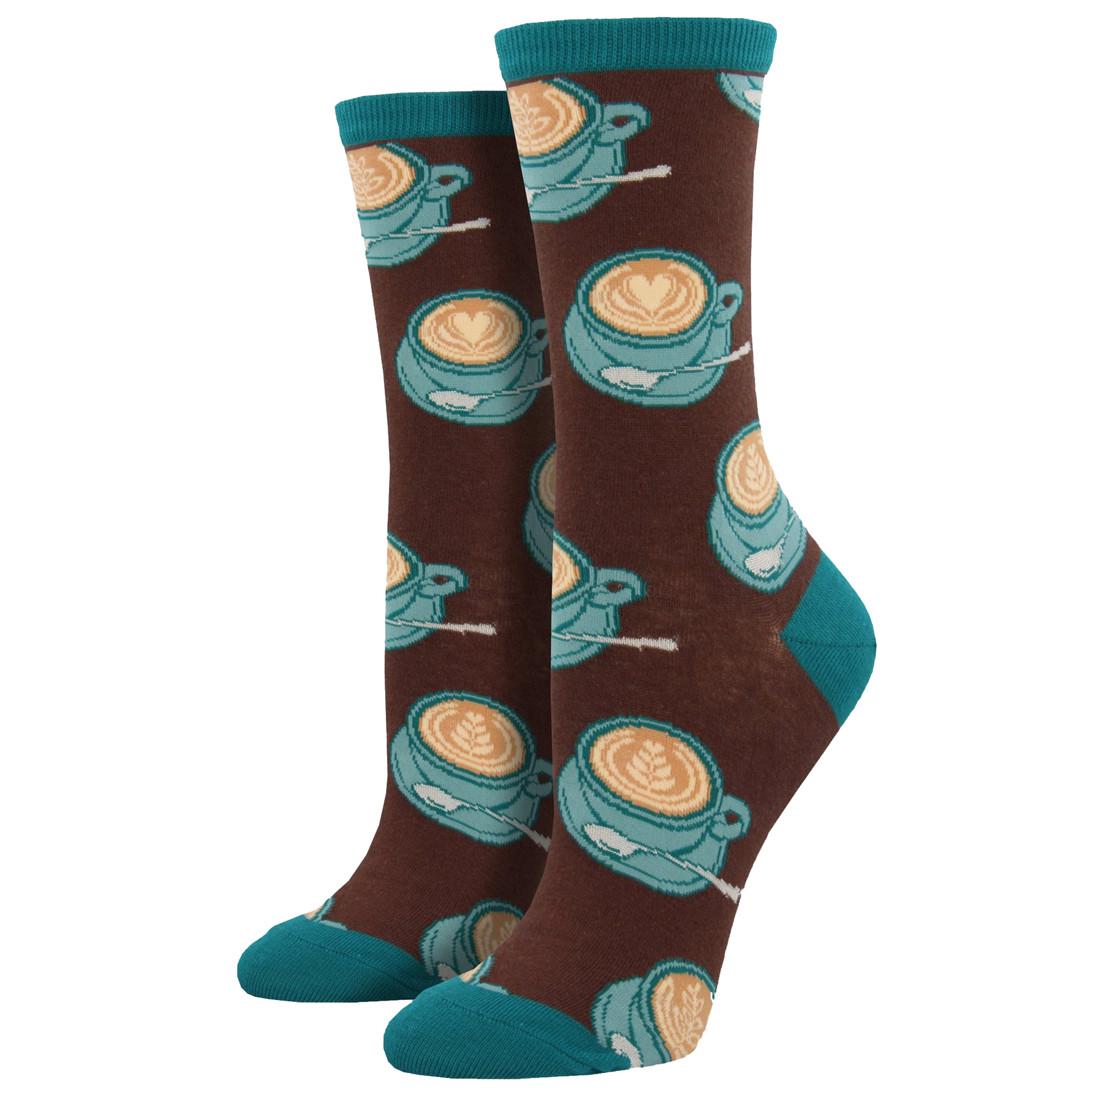 Women's Crew Socks Well Latte Da Coffee Brown